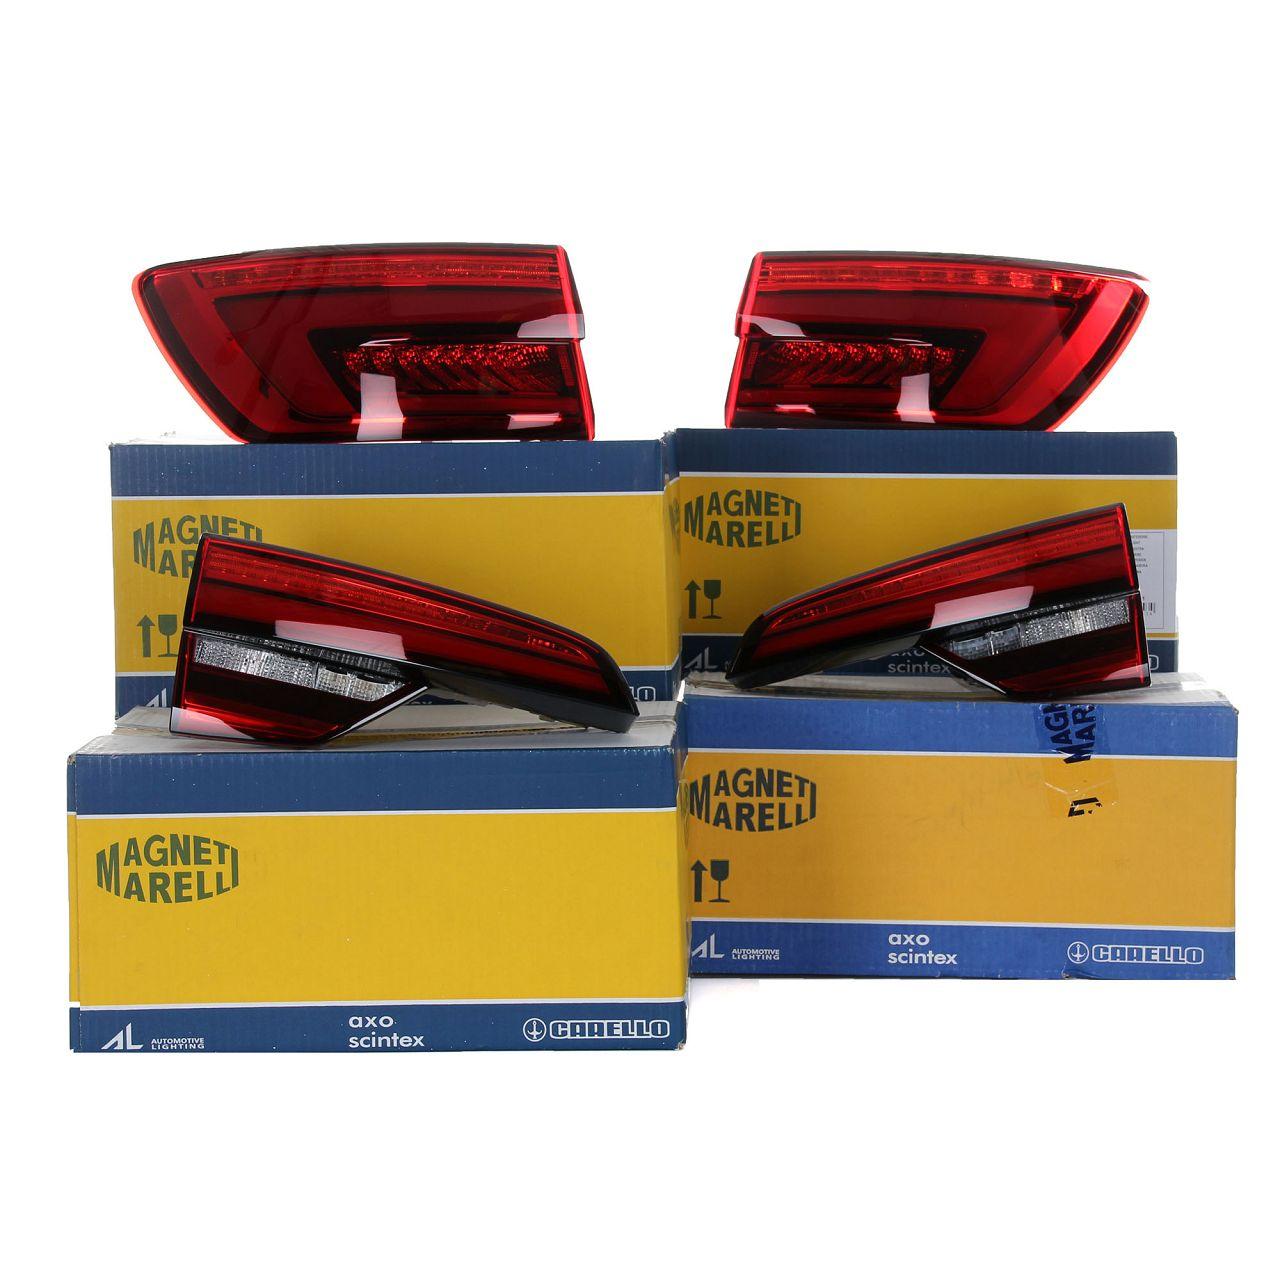 MAGNETI MARELLI Heckleuchte Rückleuchten Set LED für AUDI A4 AVANT (8W5 B9)